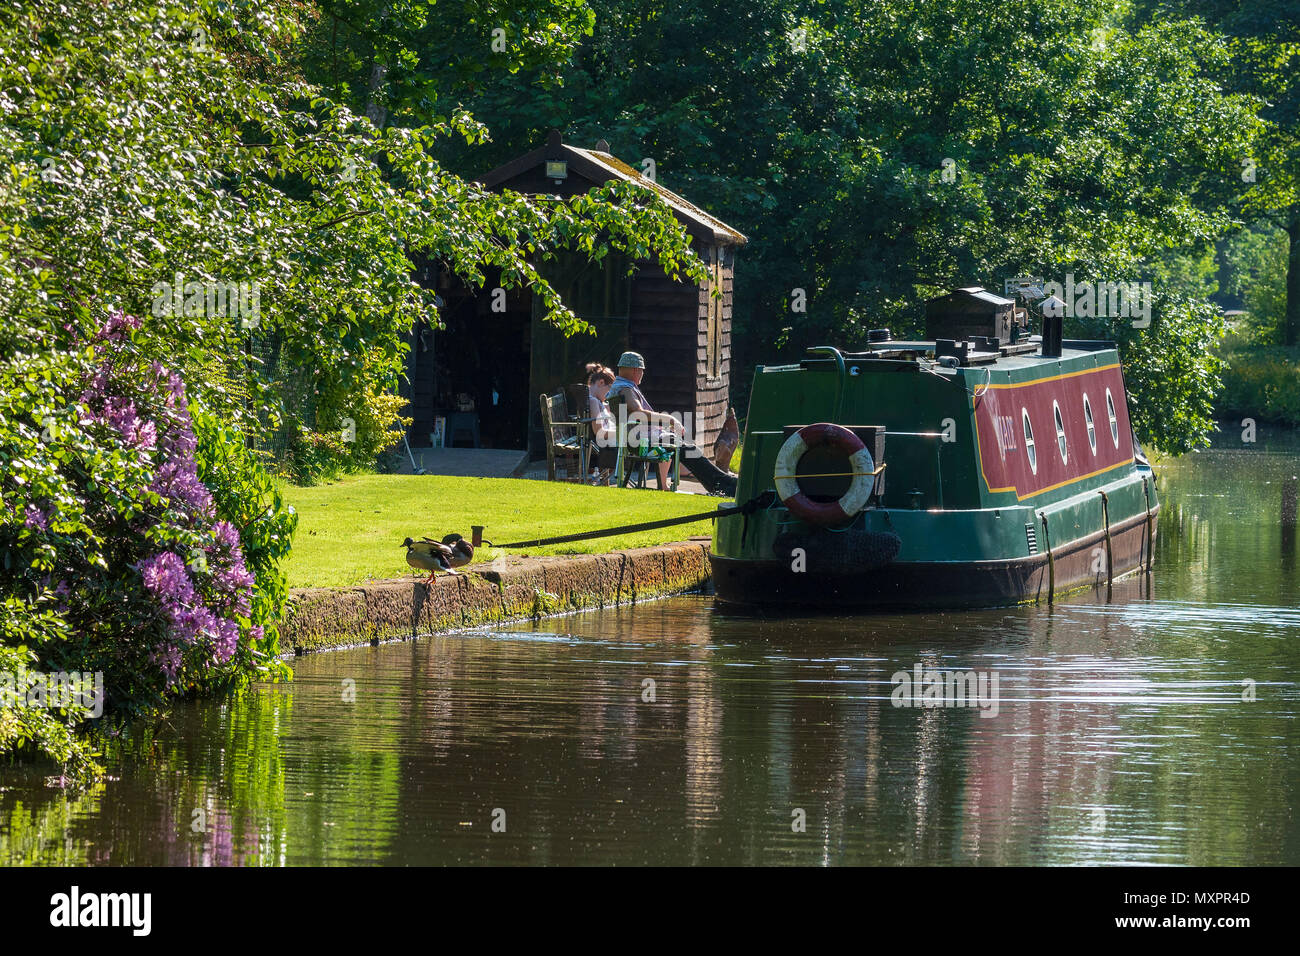 Canalbank garden narrowboat - Stock Image